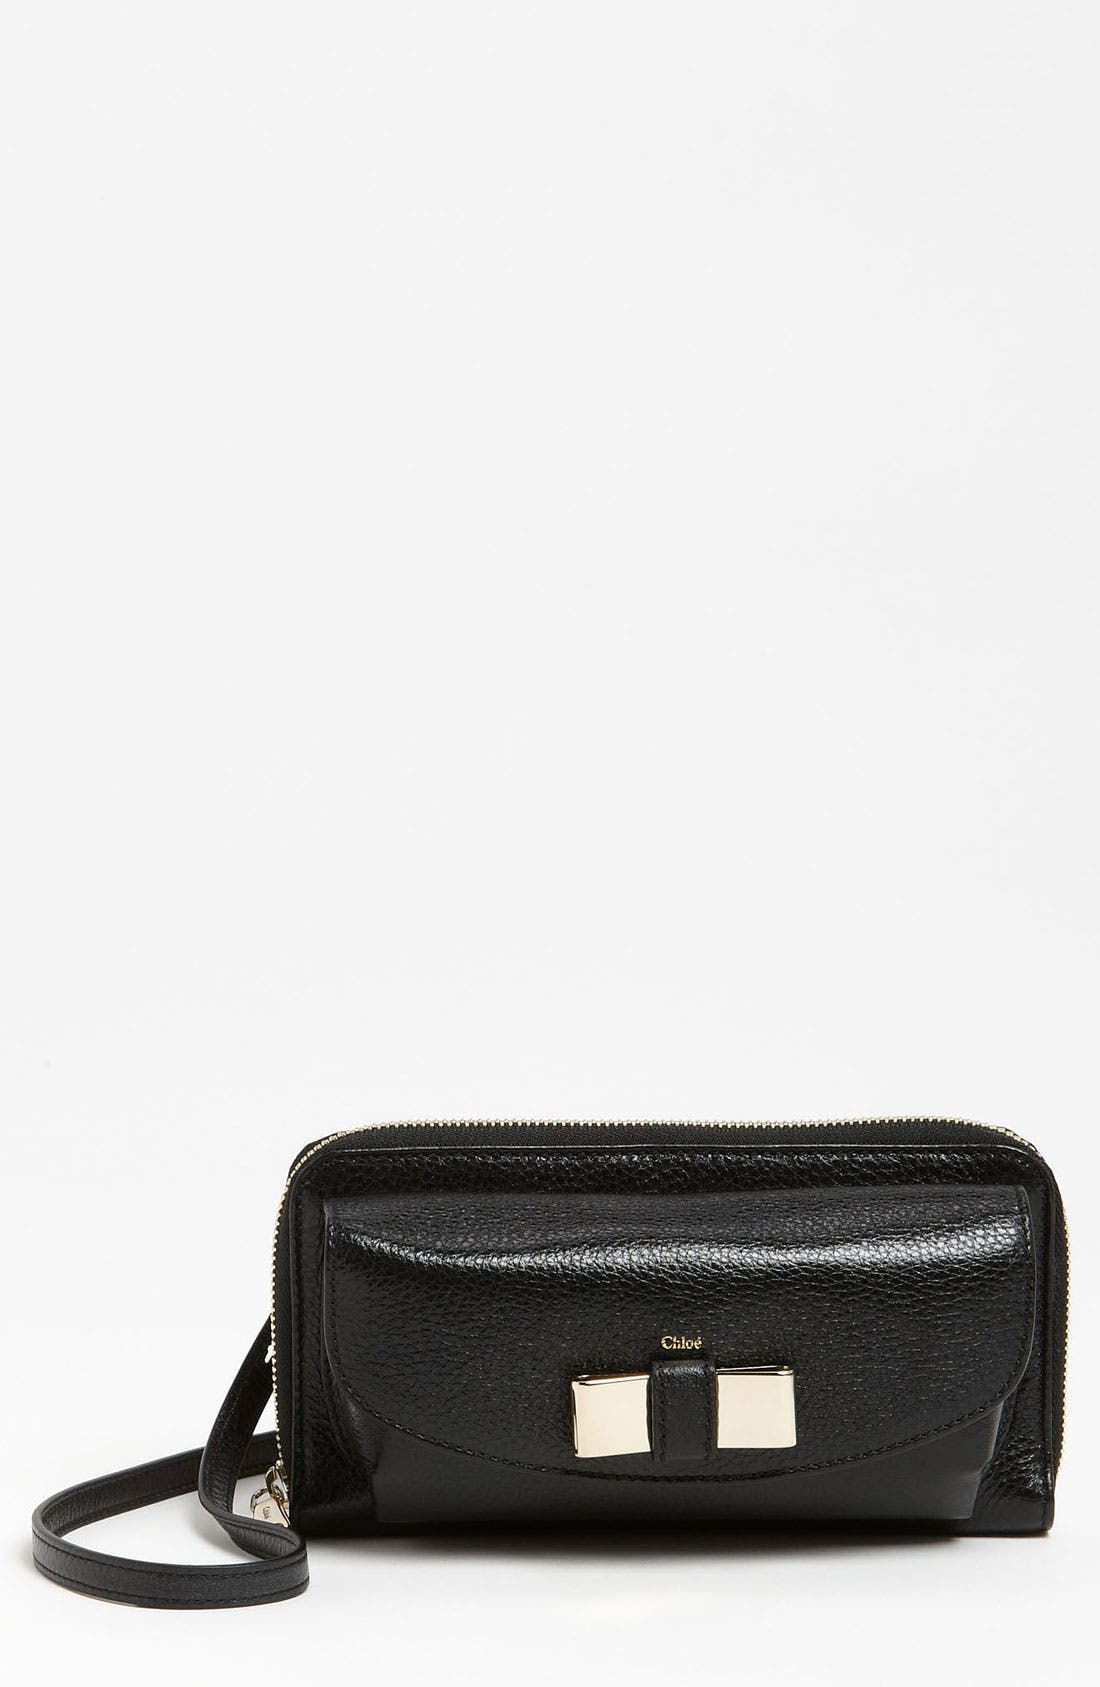 Main Image - Chloé 'Lily - Long' Sunglasses Case & Crossbody Wallet